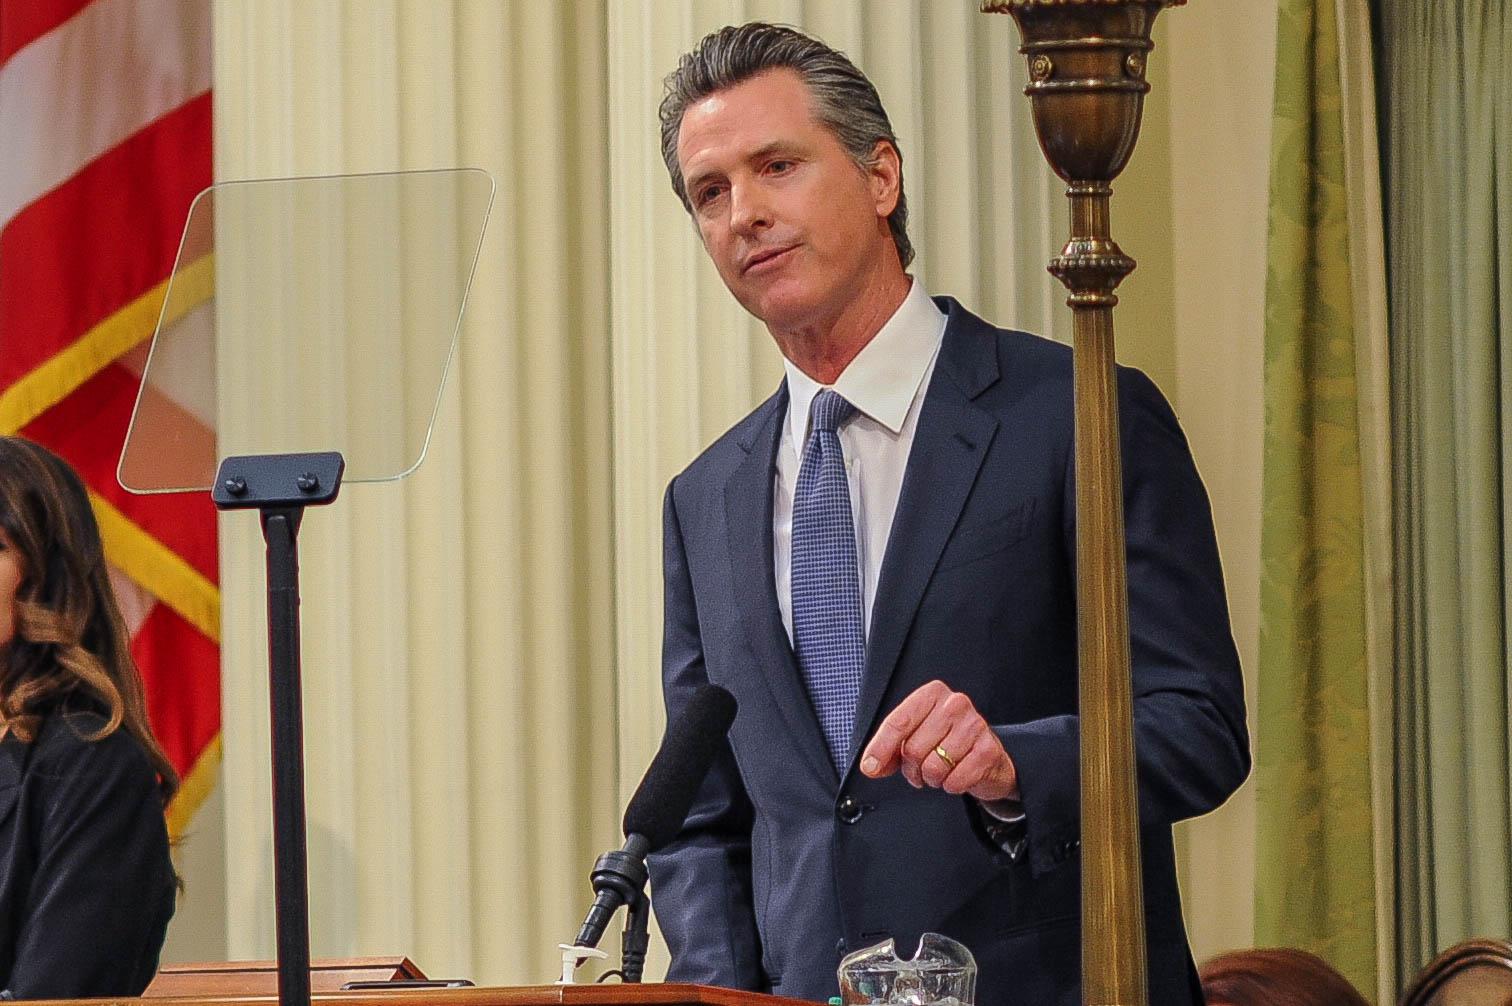 Gov. Newsom Breaks State COVID-19 Guidelines For a Birthday Party in Napa County - California Globe